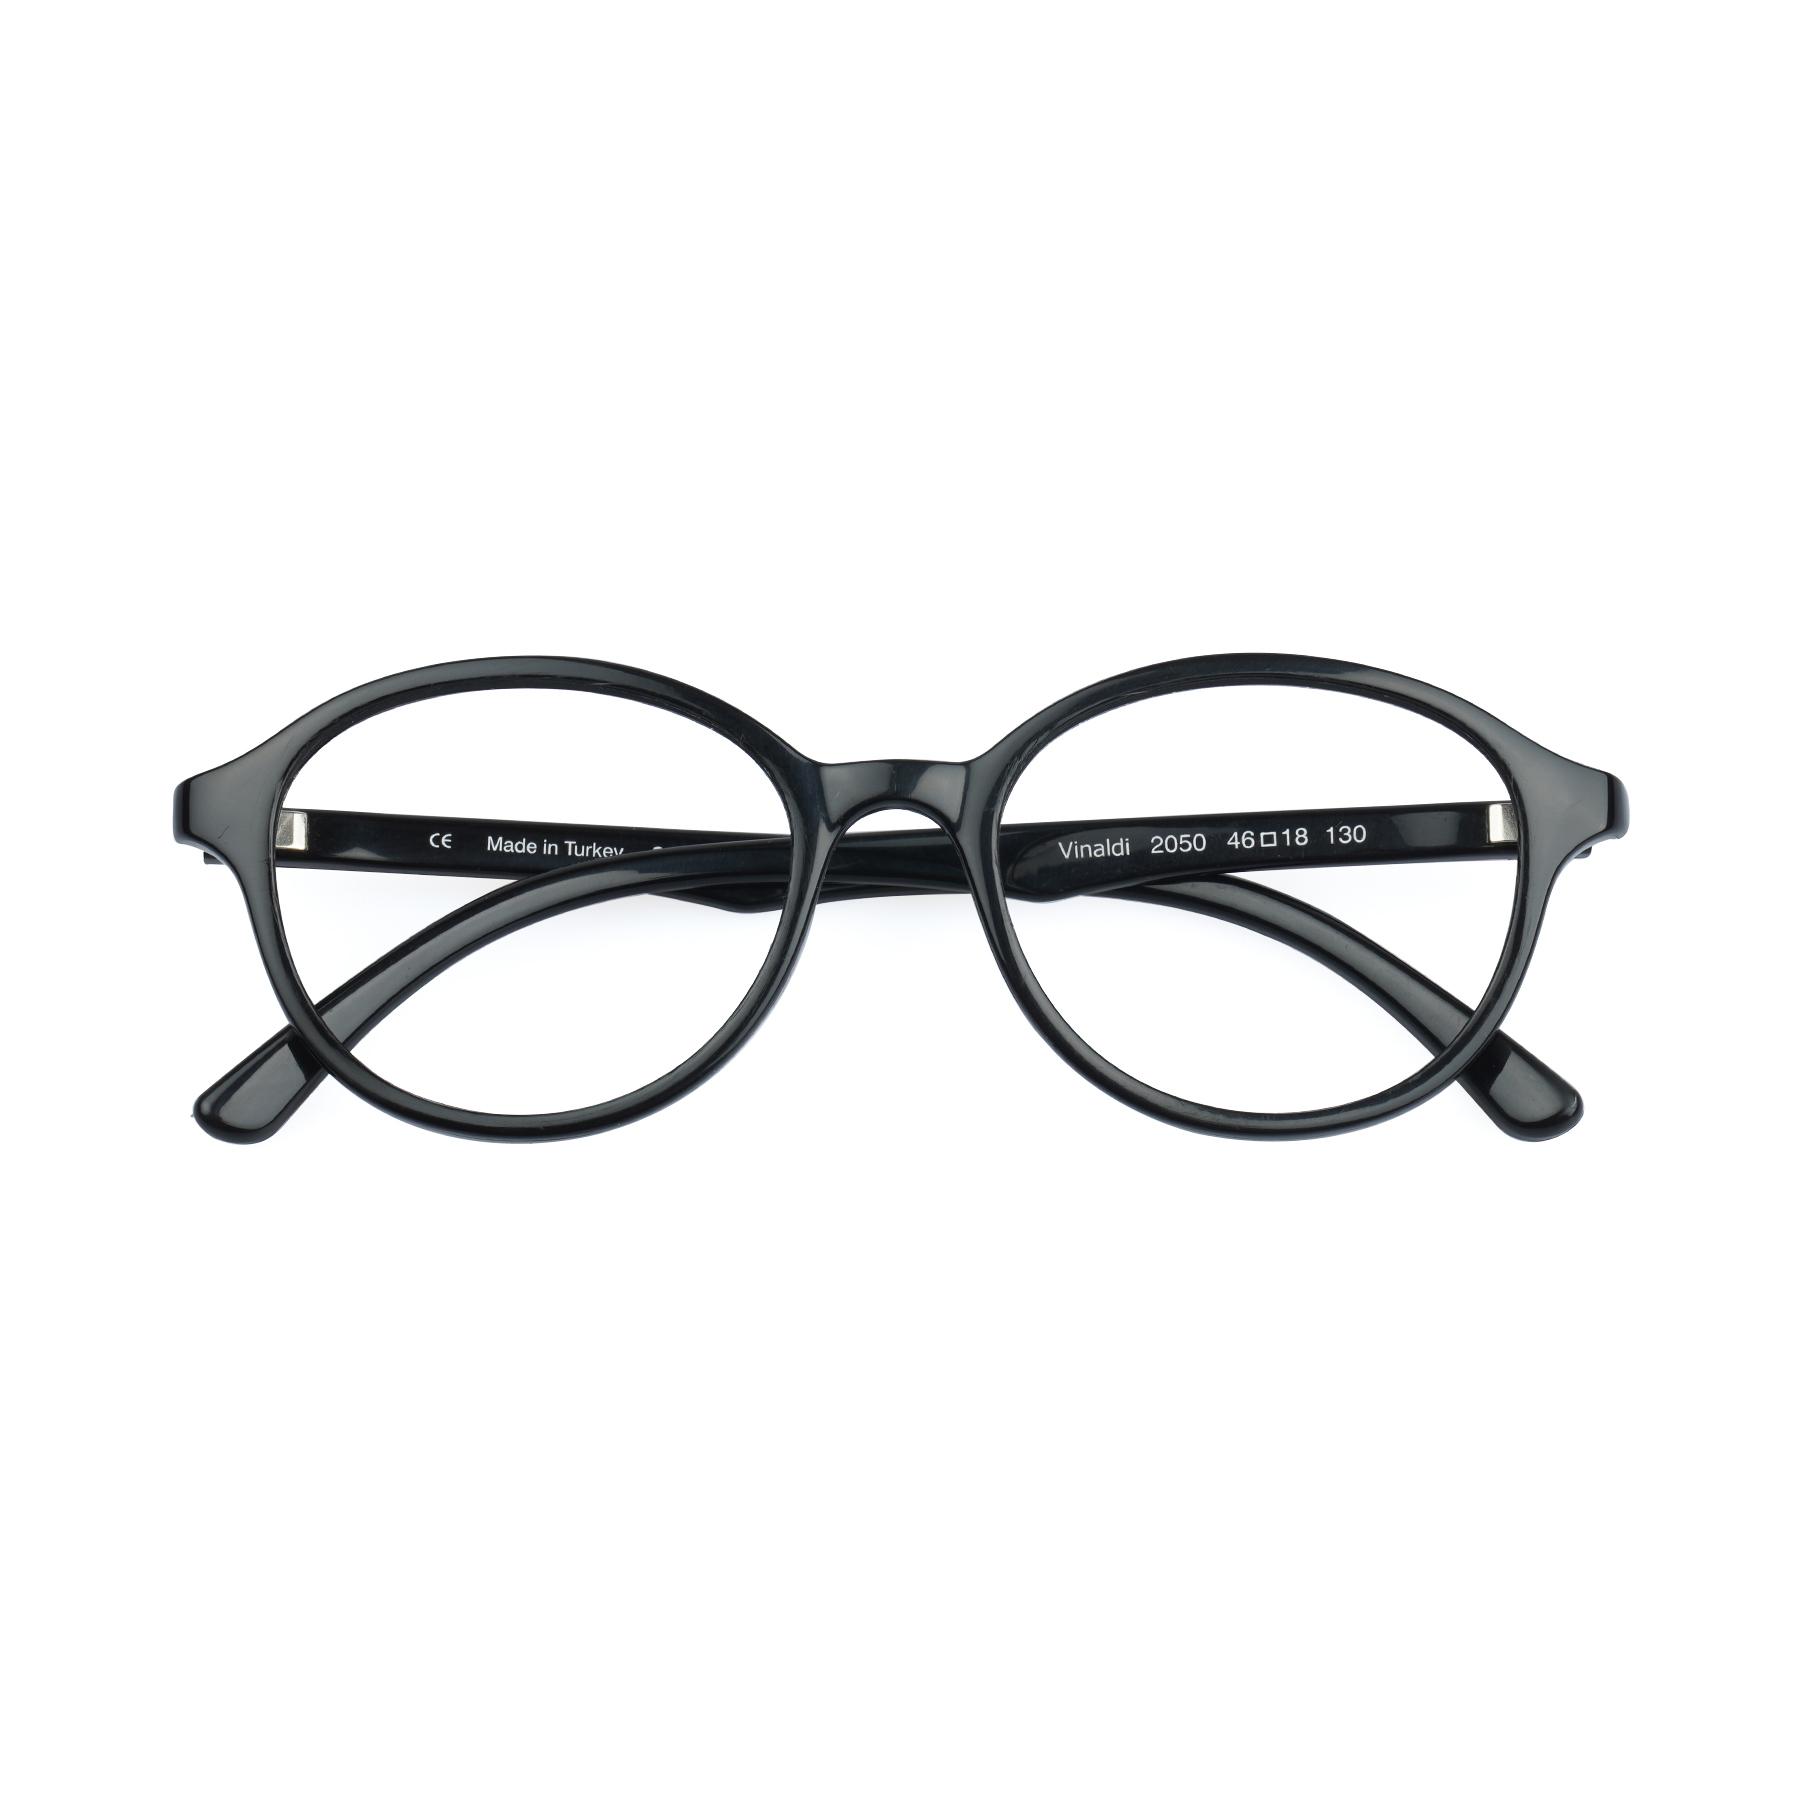 Vinaldi 2050 Optical Frames